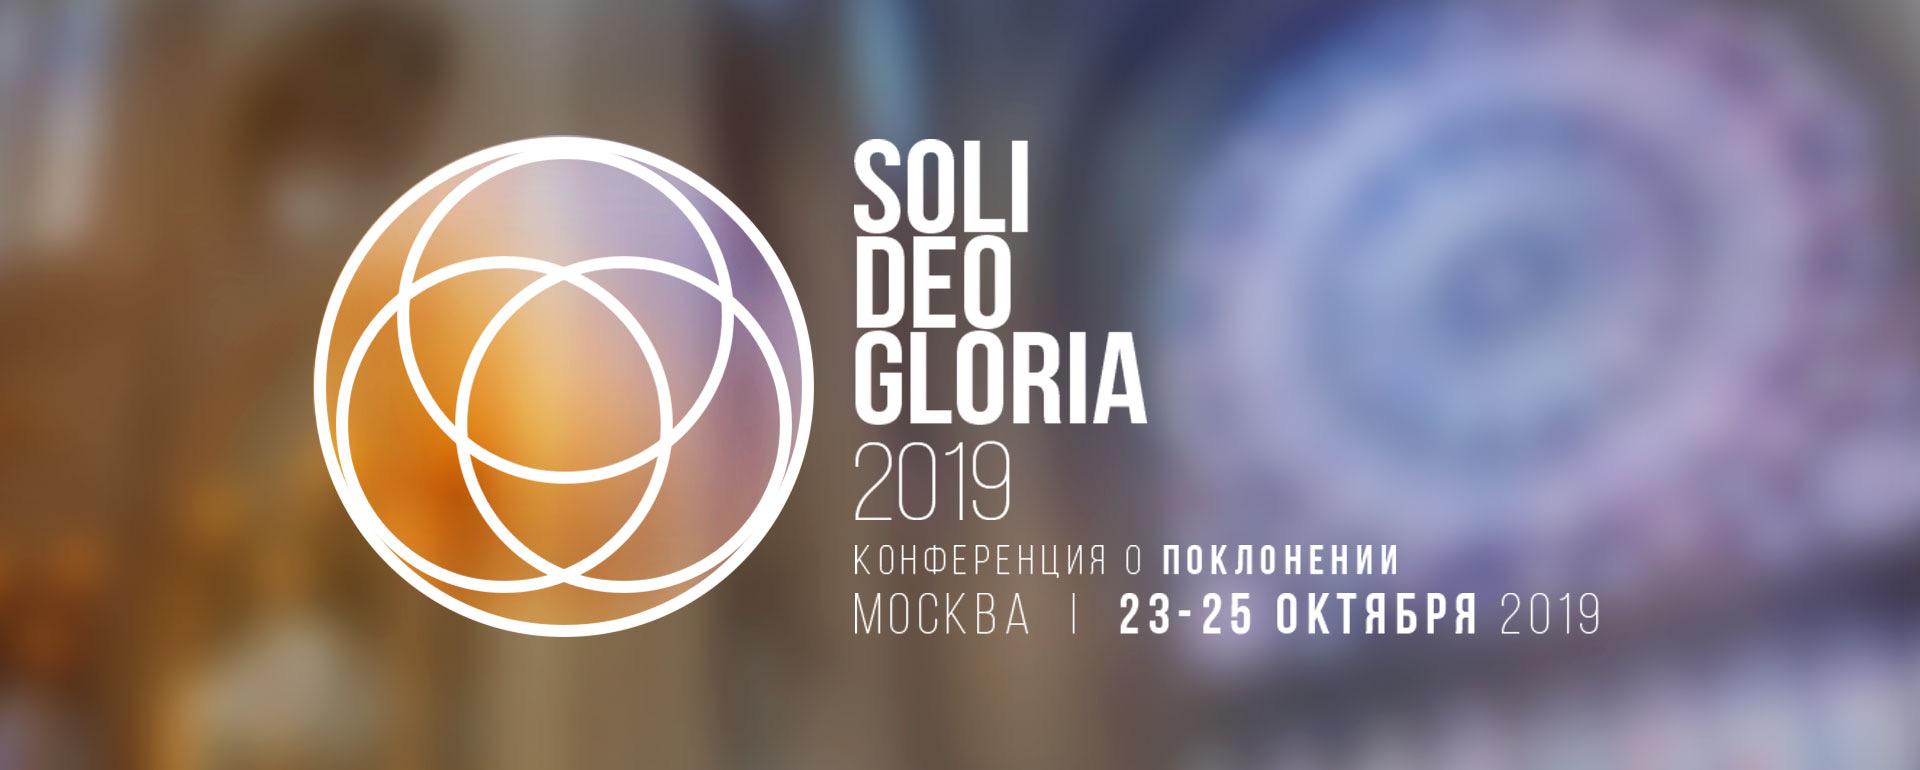 Soli Deo Gloria 2020